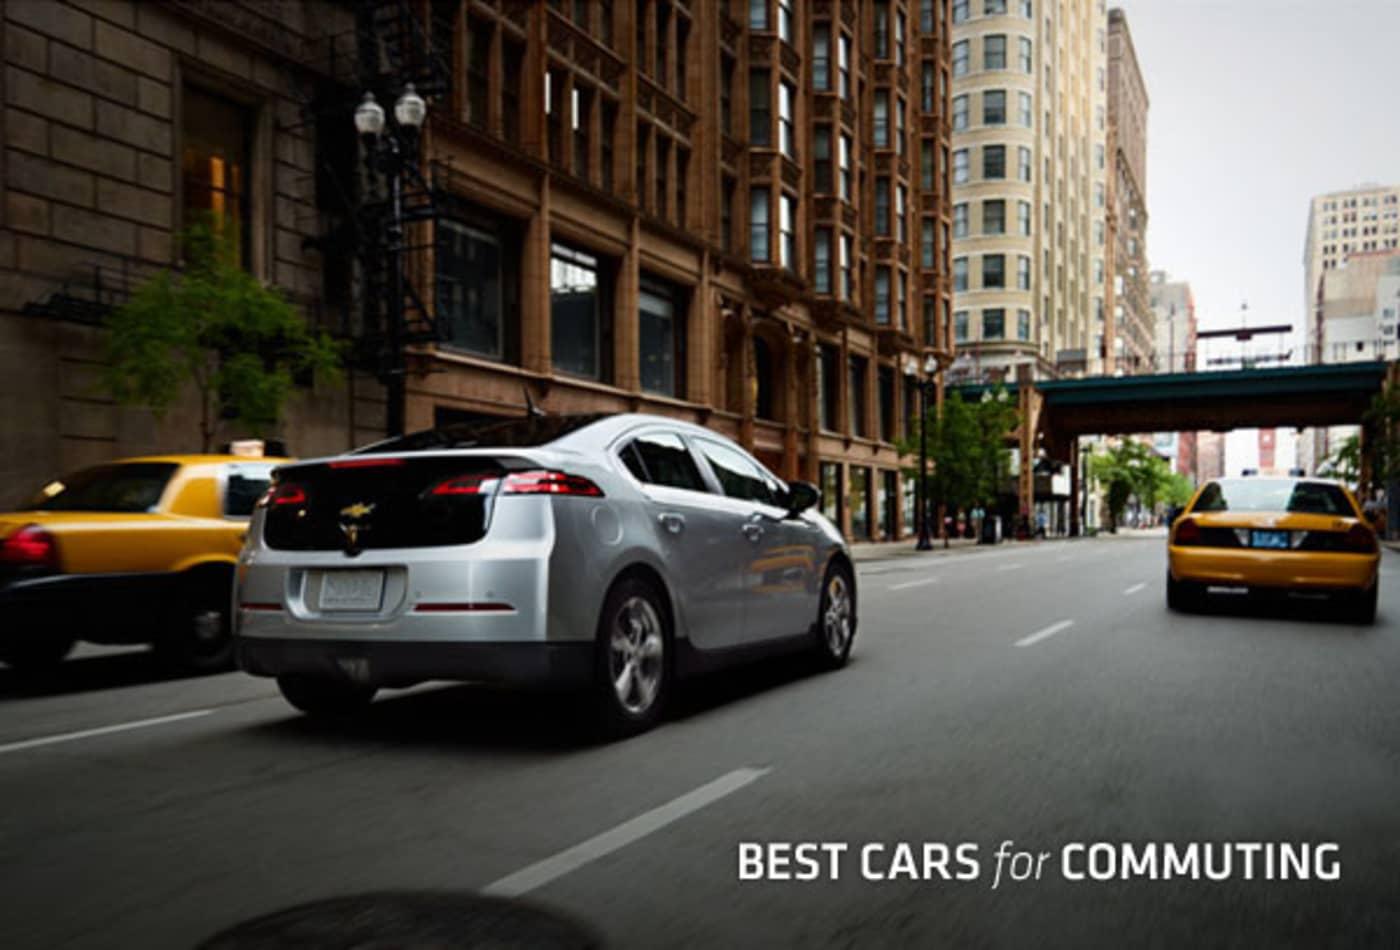 Cover-Chevrolet-Volt-Best-Cars-Commuting-CNBC.jpg